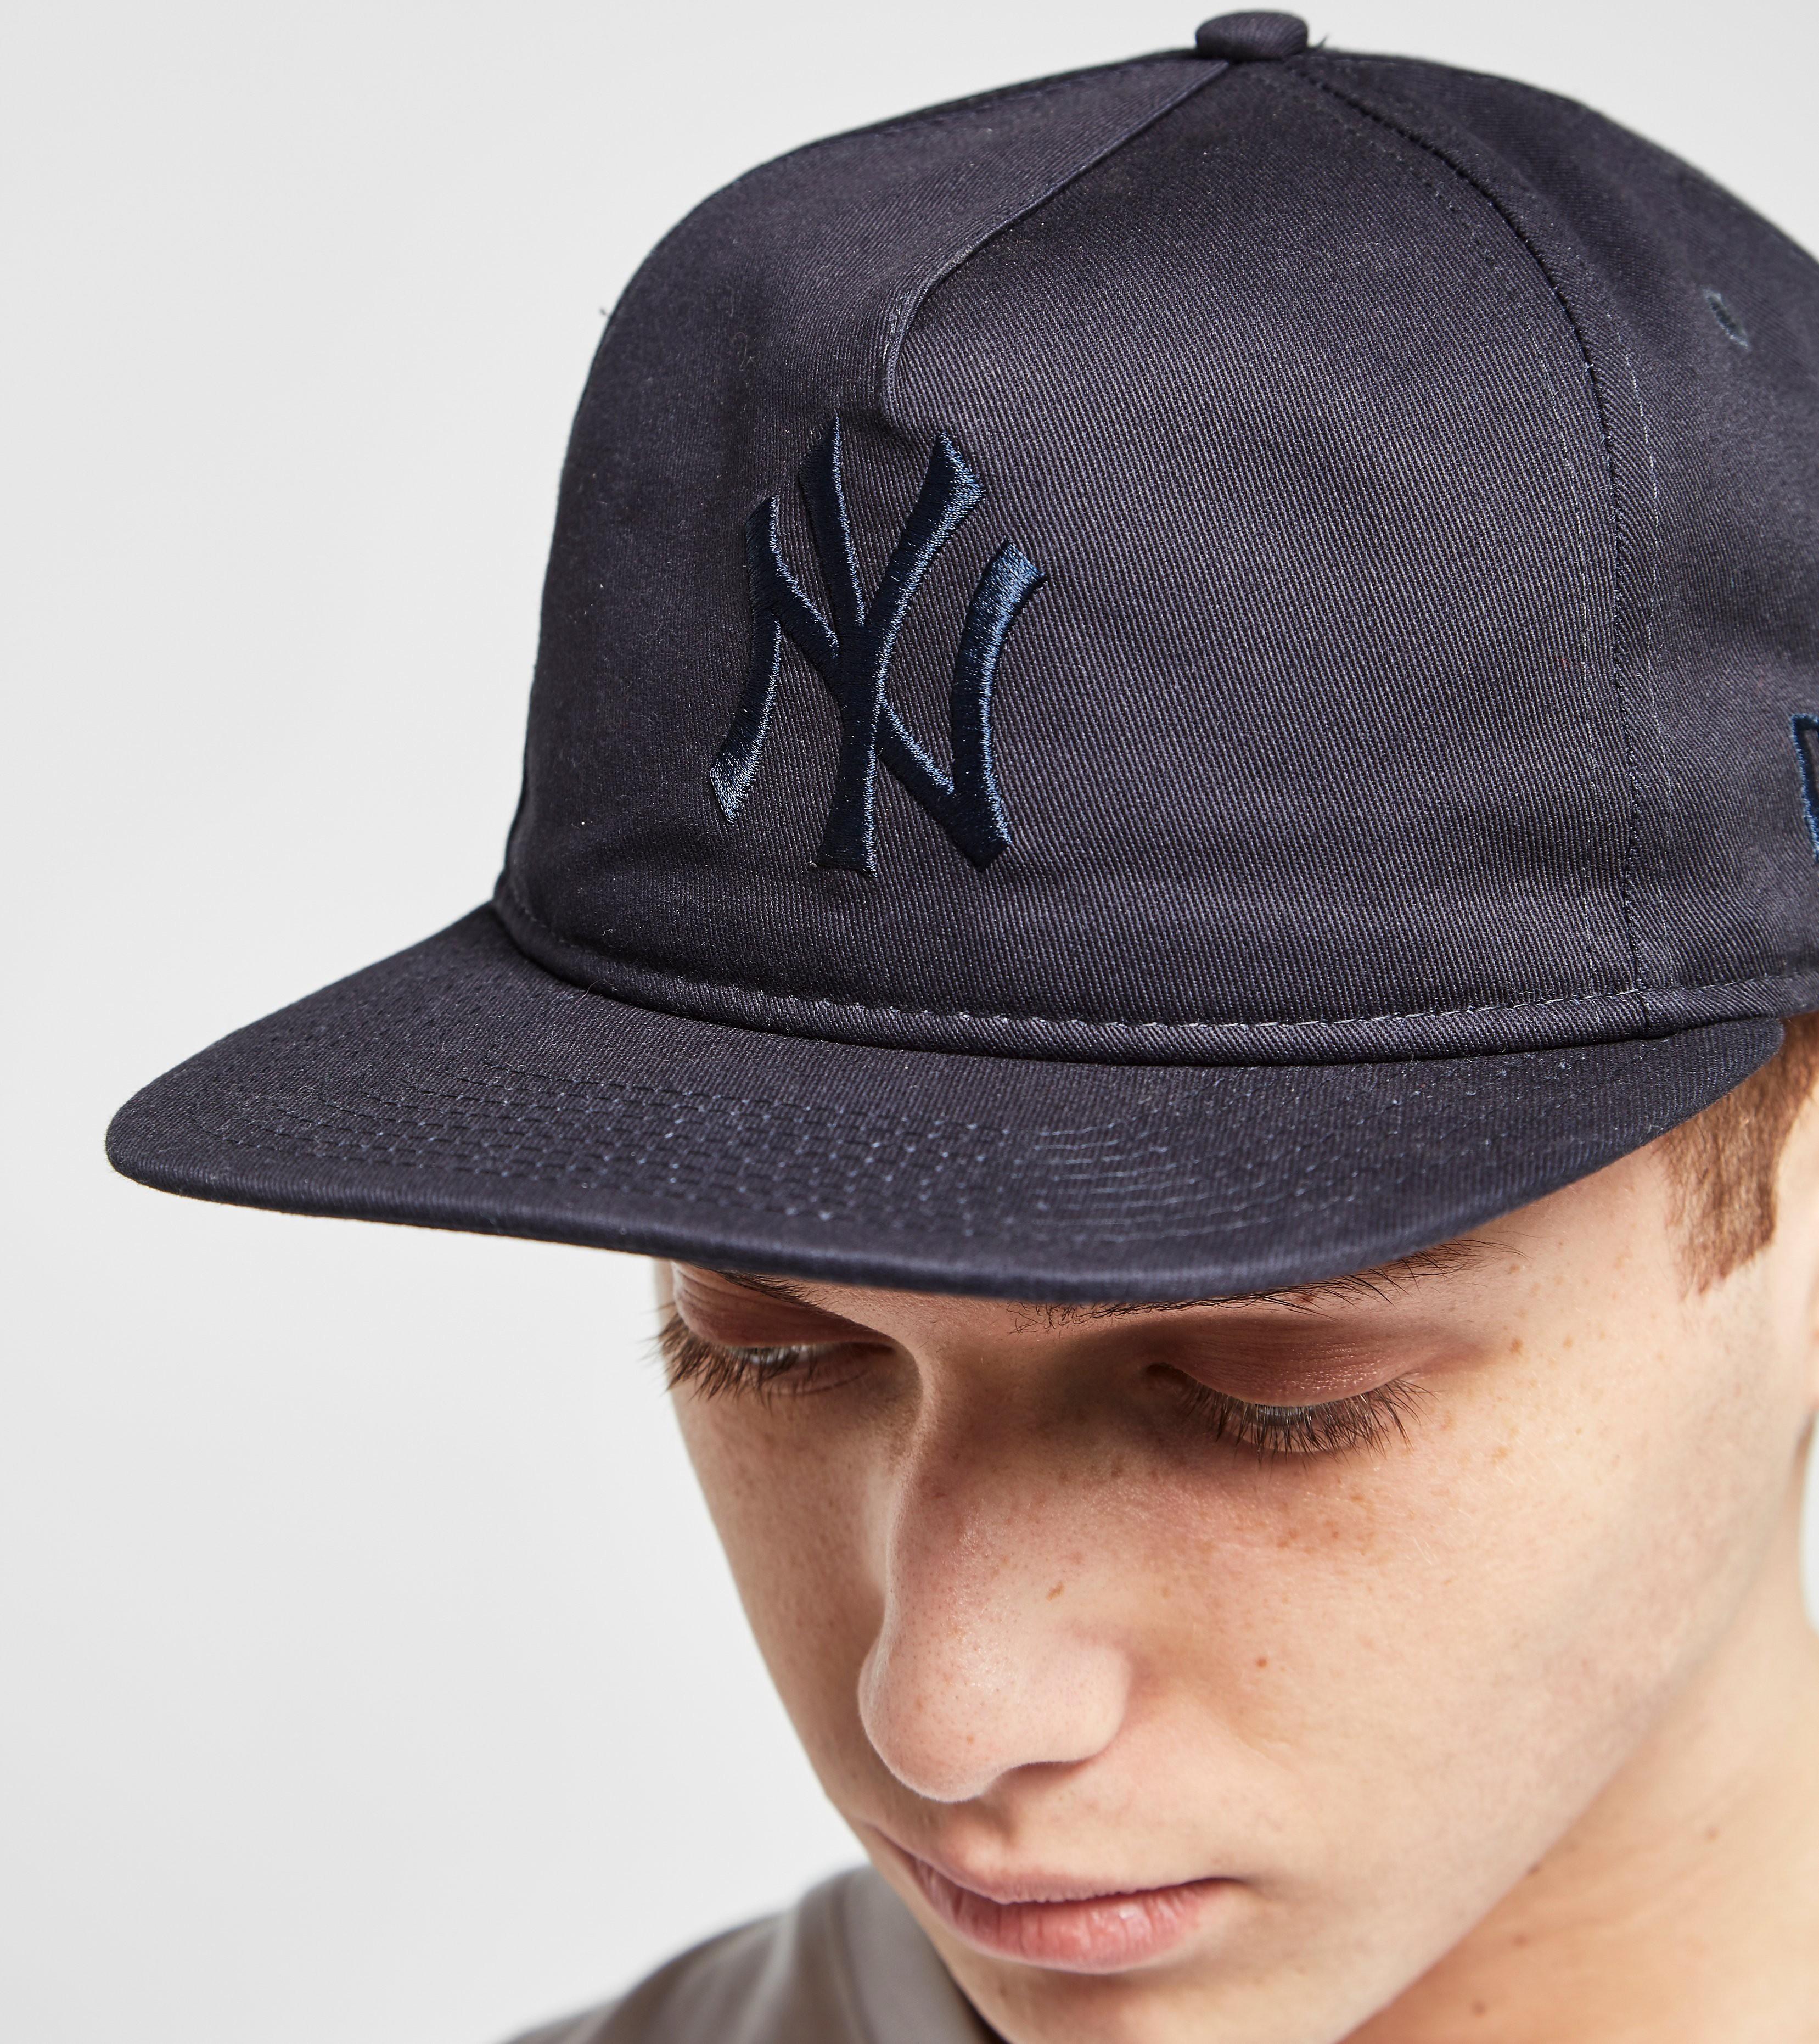 New Era 9FIFTY Snapback Cap